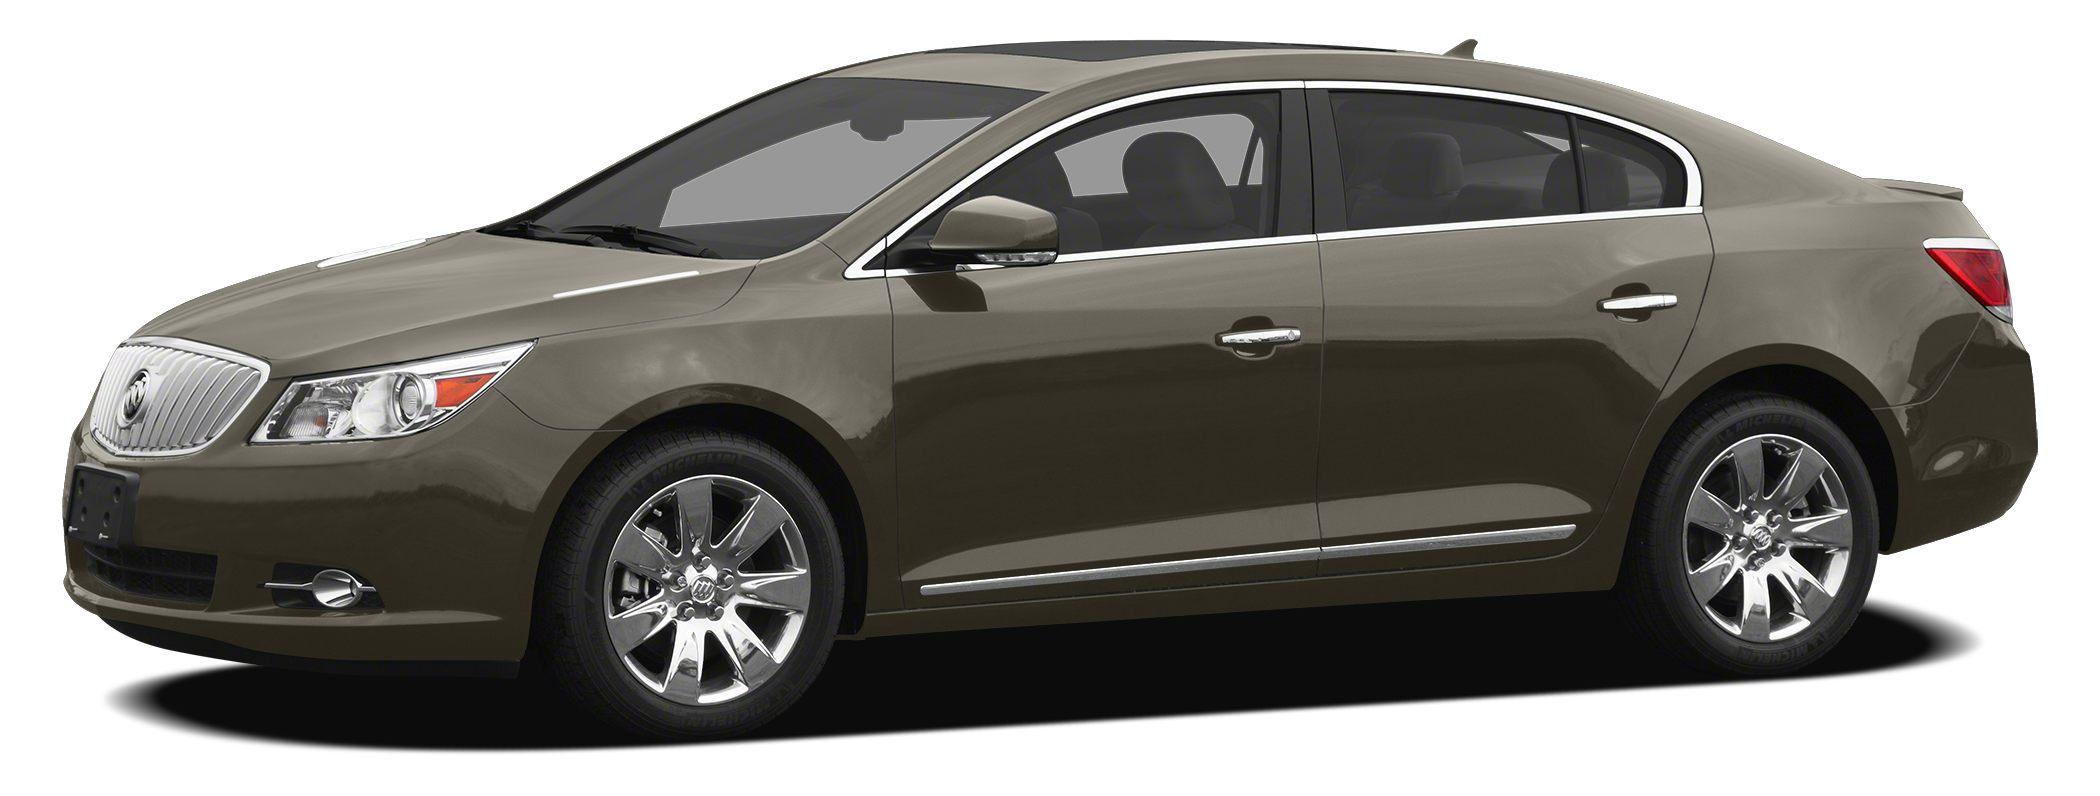 2012 Buick LaCrosse Premium 1 Group Brown 2012 Buick LaCrosse Premium 1 Group FWD 6-Speed Automati